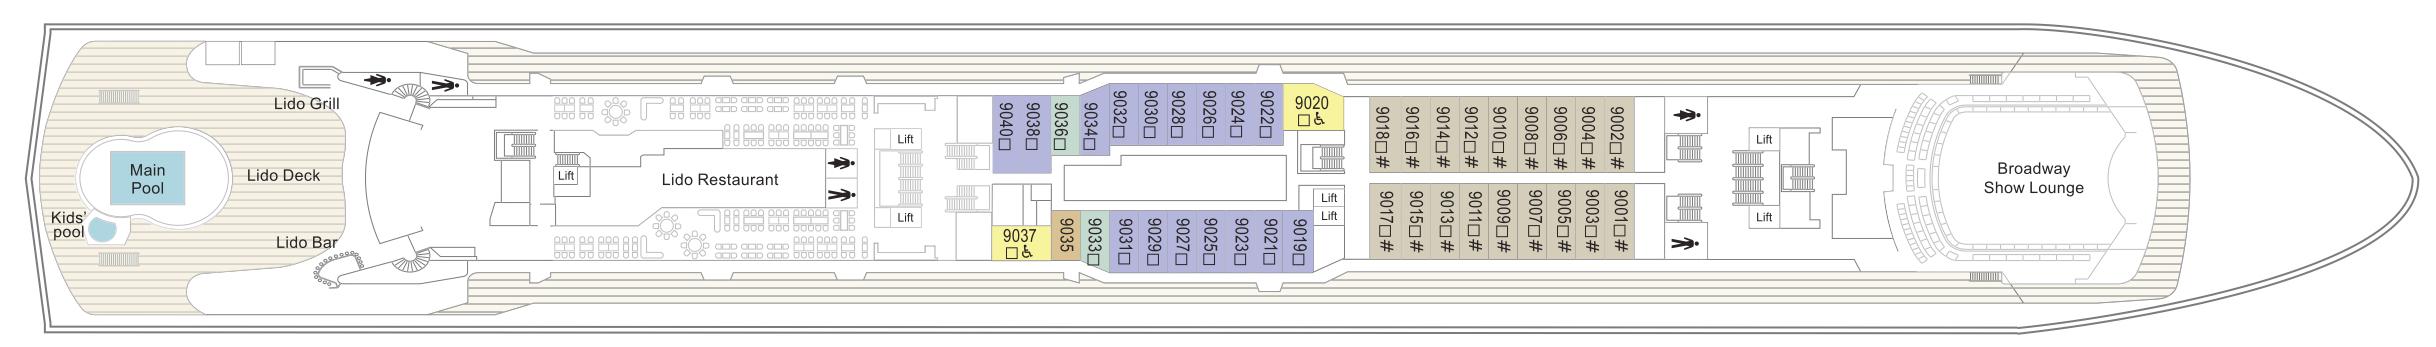 Thomson Cruises Thomson Dream Deck Plans Deck 9.jpg